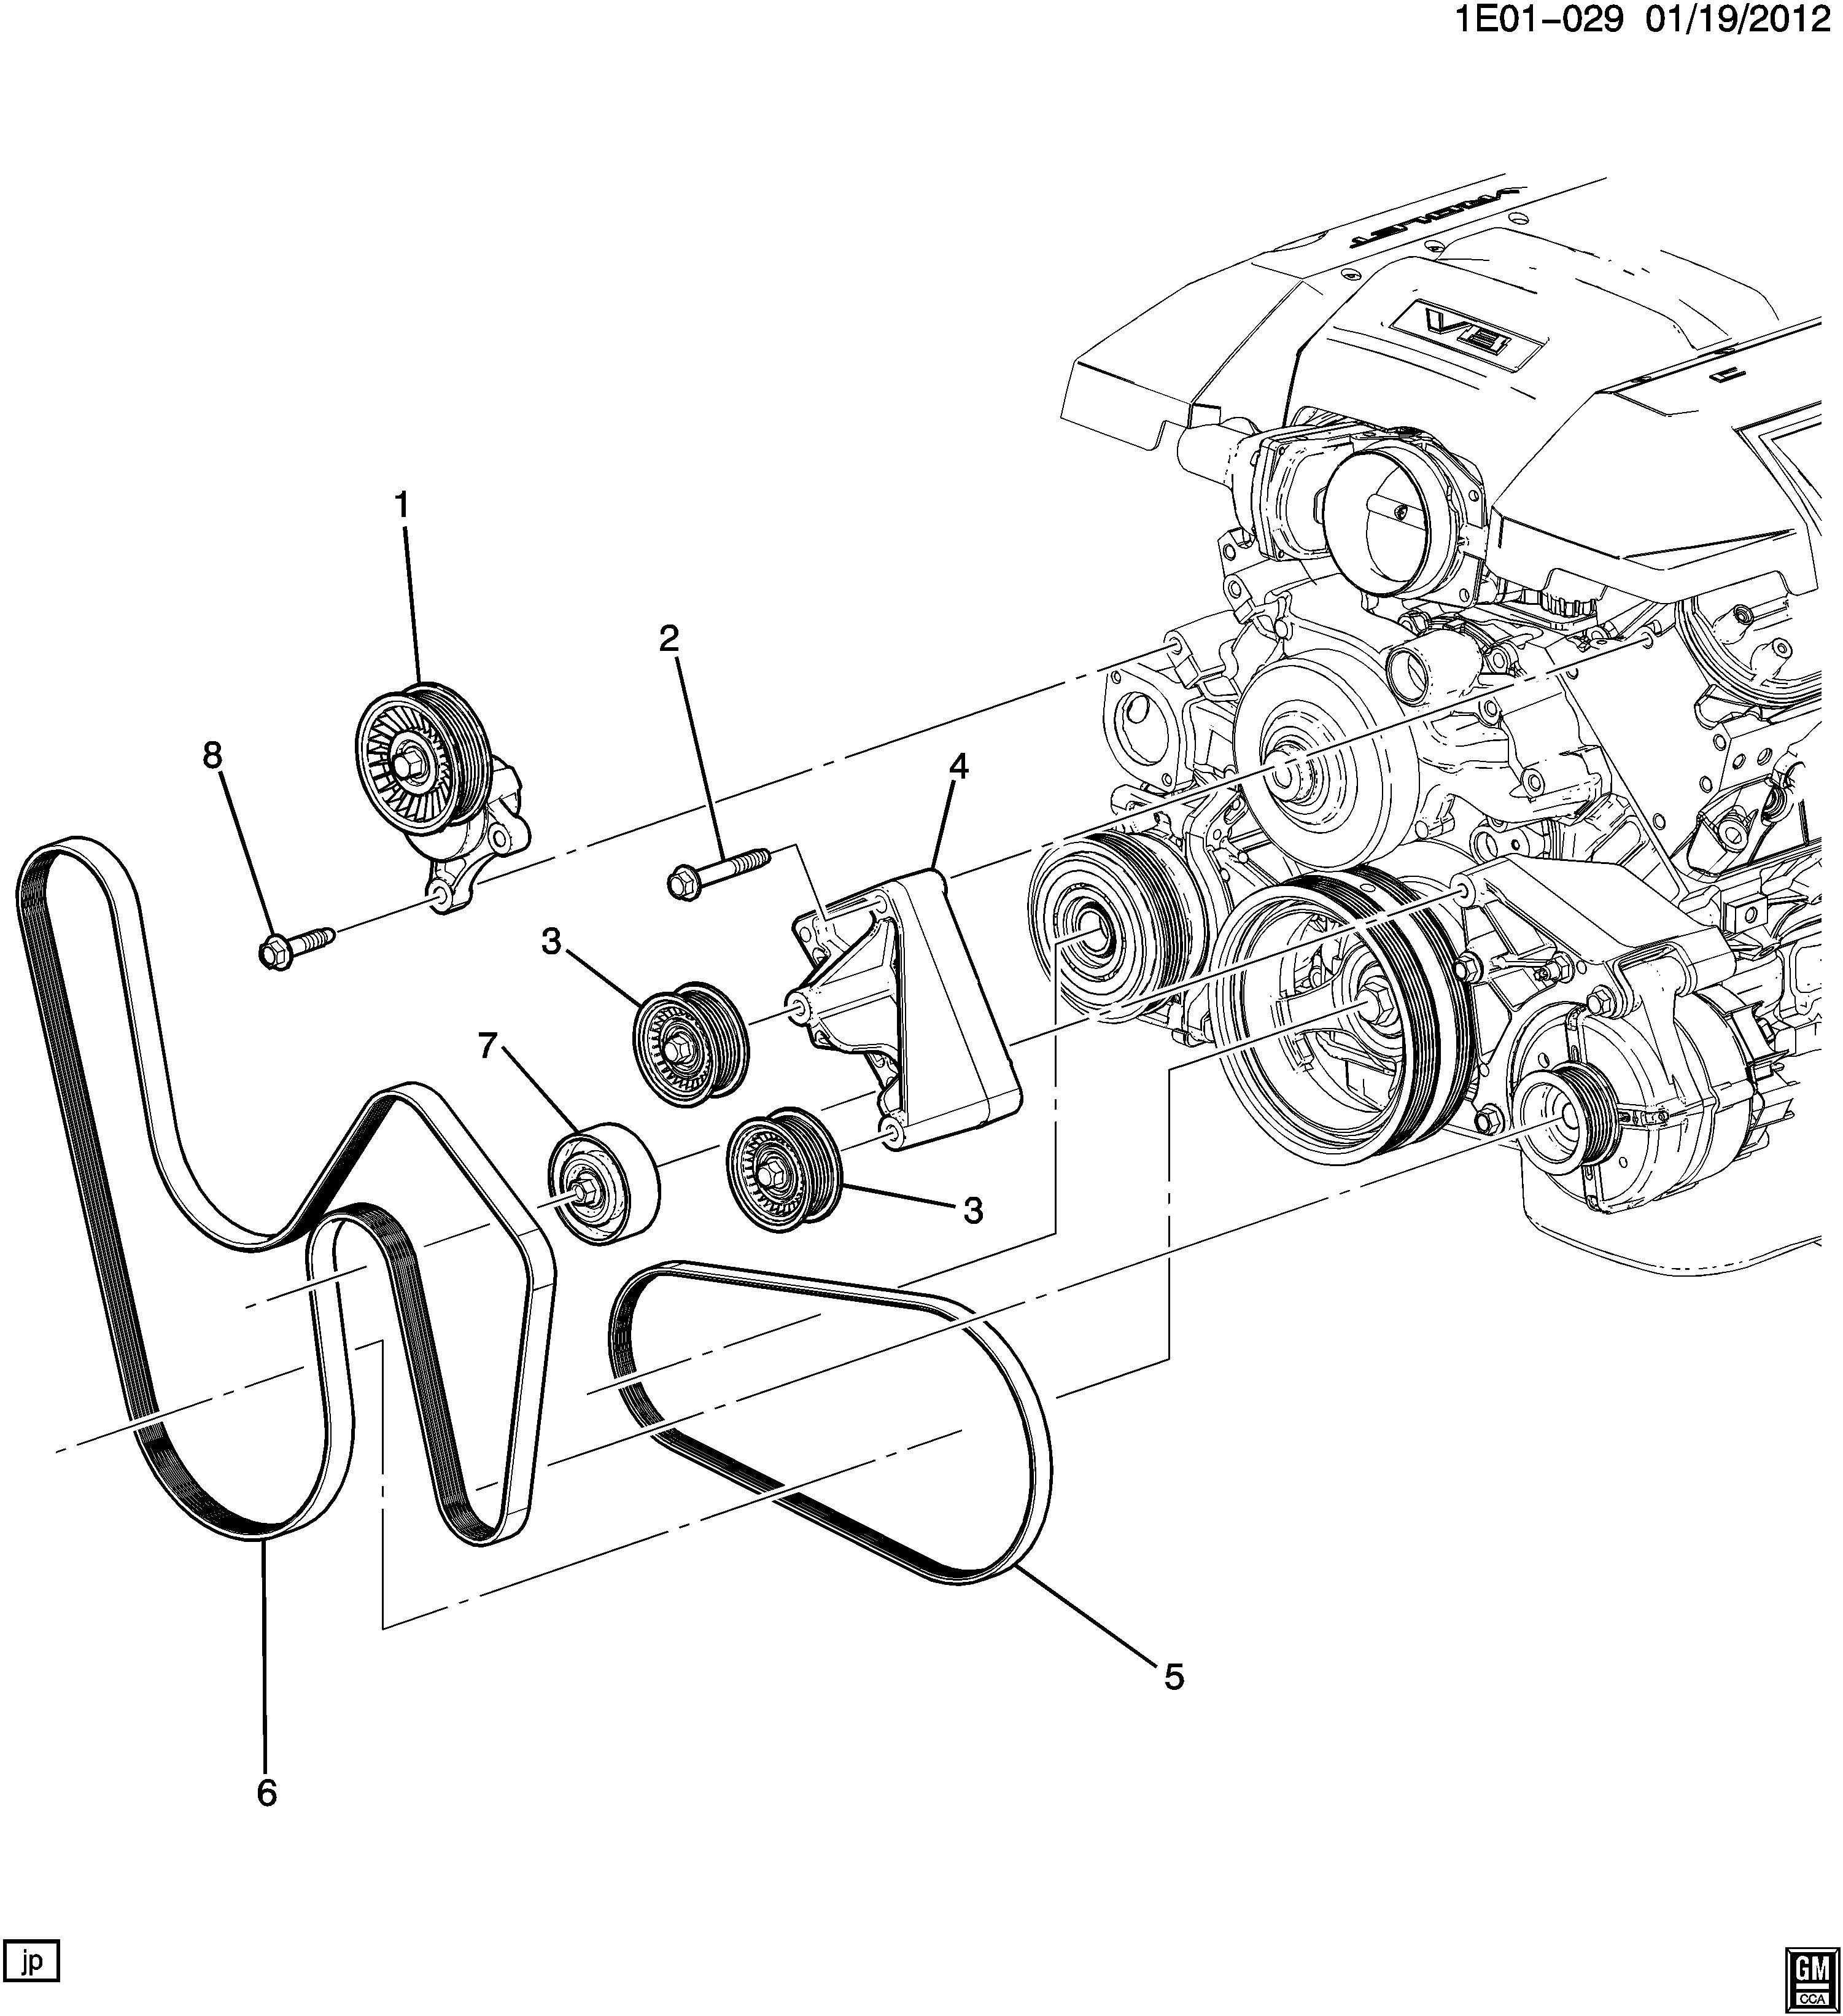 Chevrolet Camaro Ss 2ss 2dr Belt Kit Drive Belt